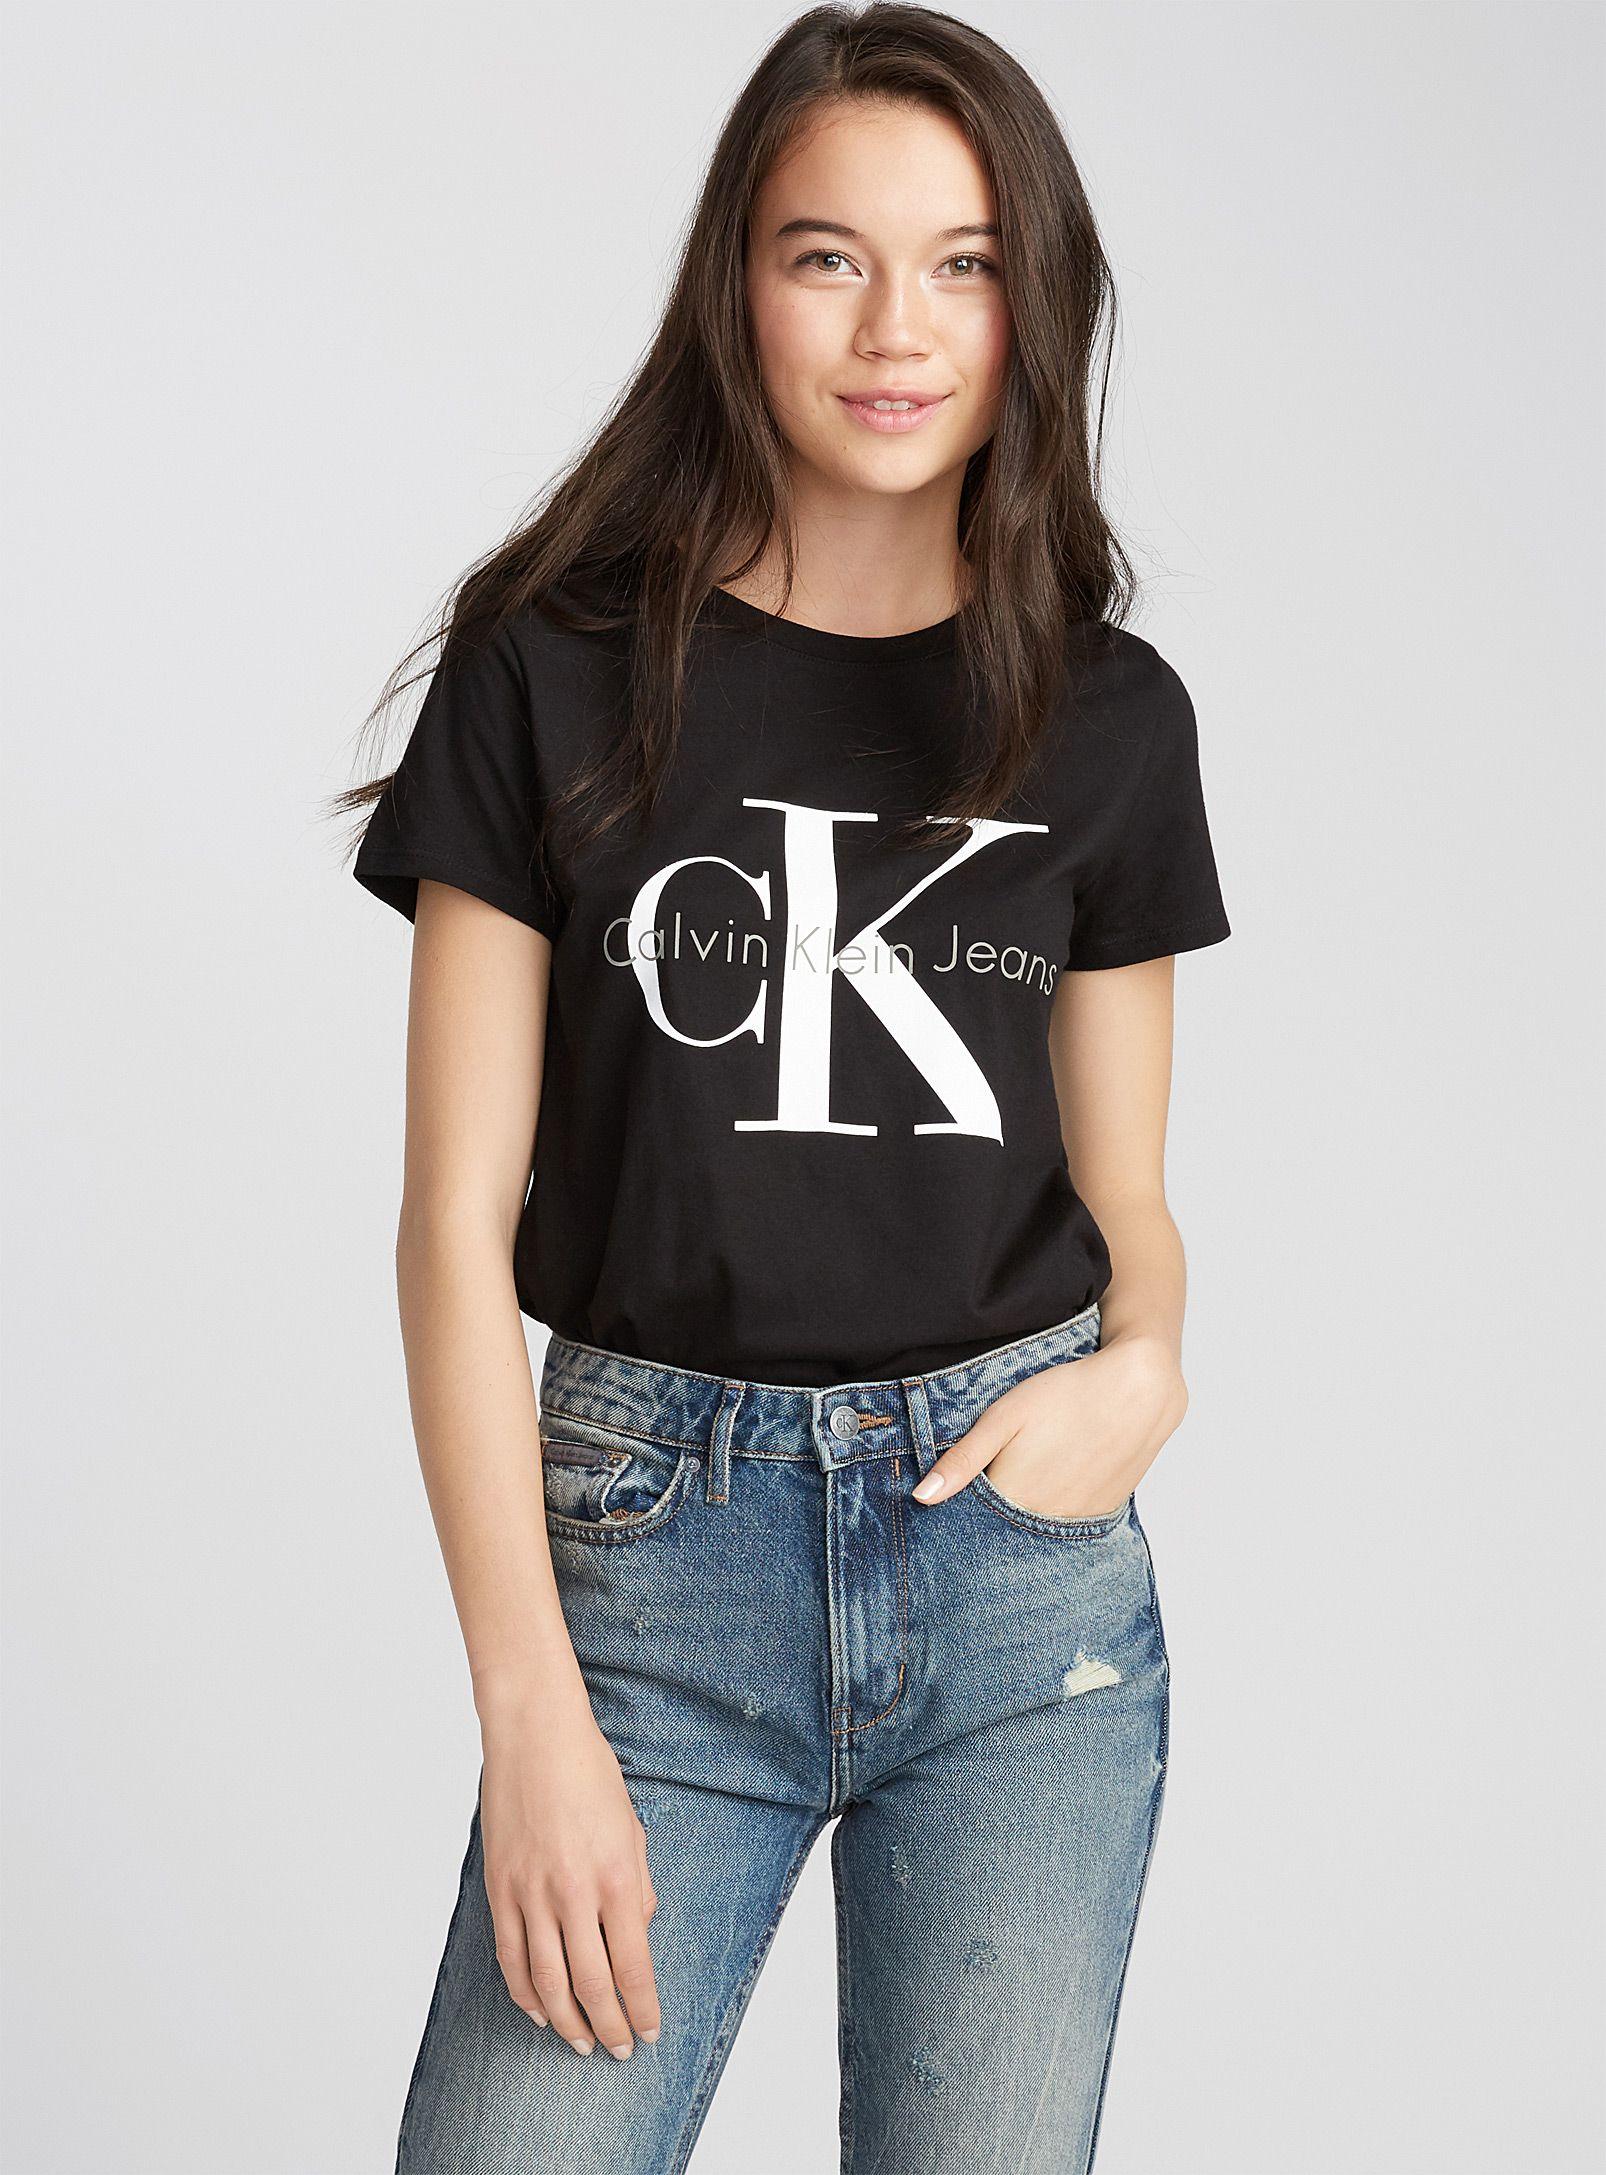 75a1beaea CK tee   Calvin Klein Jeans   Shop Women's Short Sleeve   Simons ...